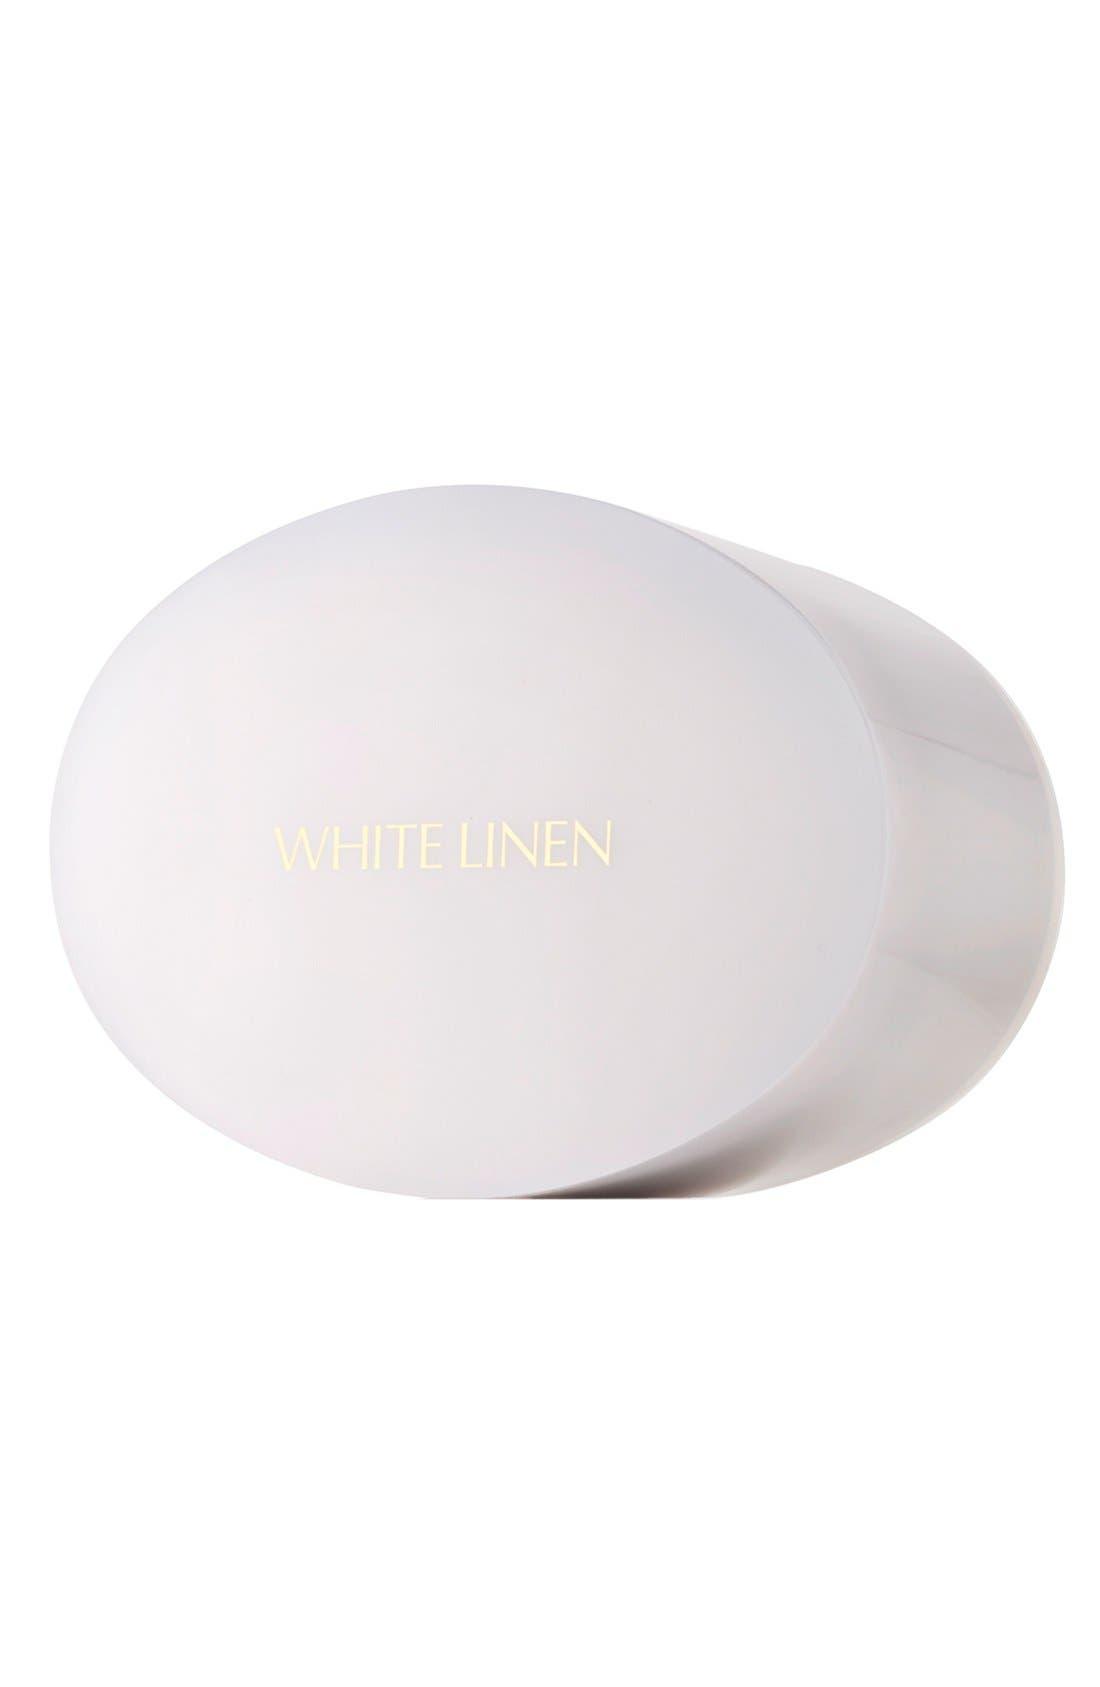 Estée Lauder White Linen Perfumed Body Powder with Puff